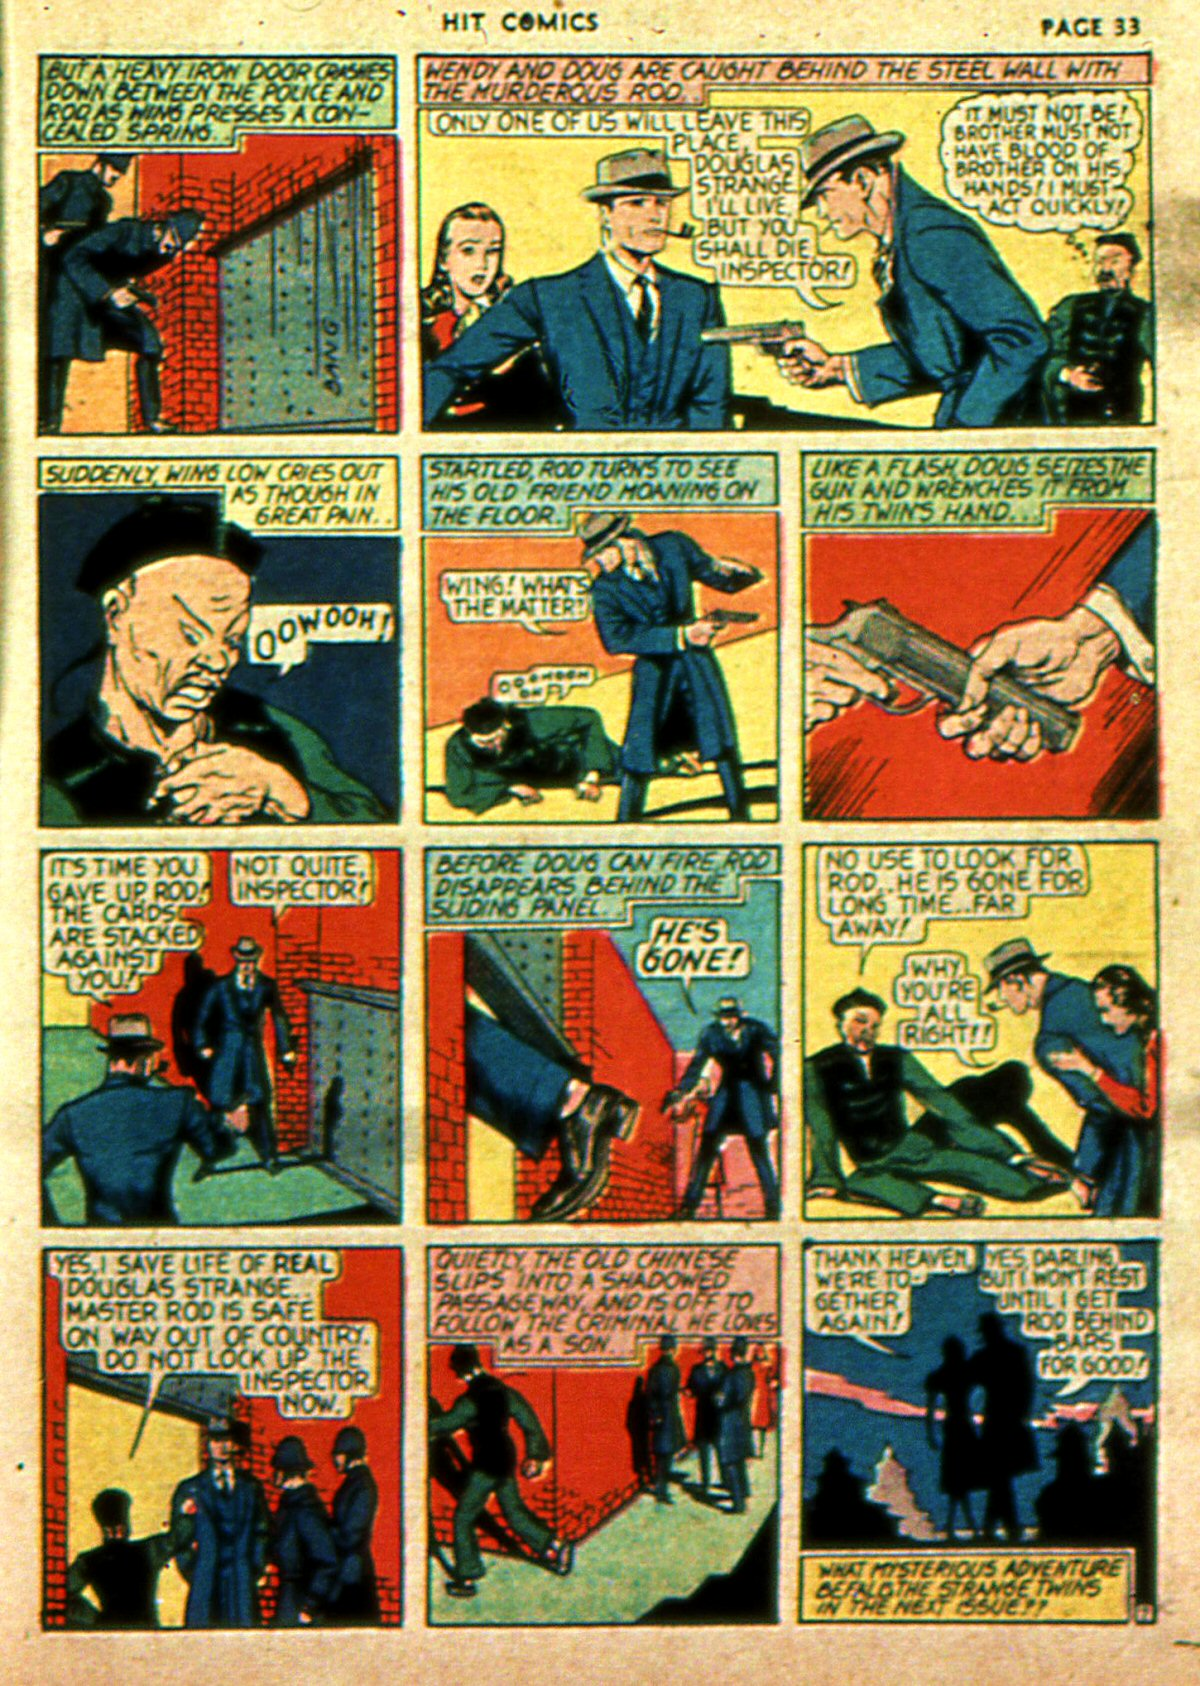 Read online Hit Comics comic -  Issue #2 - 35